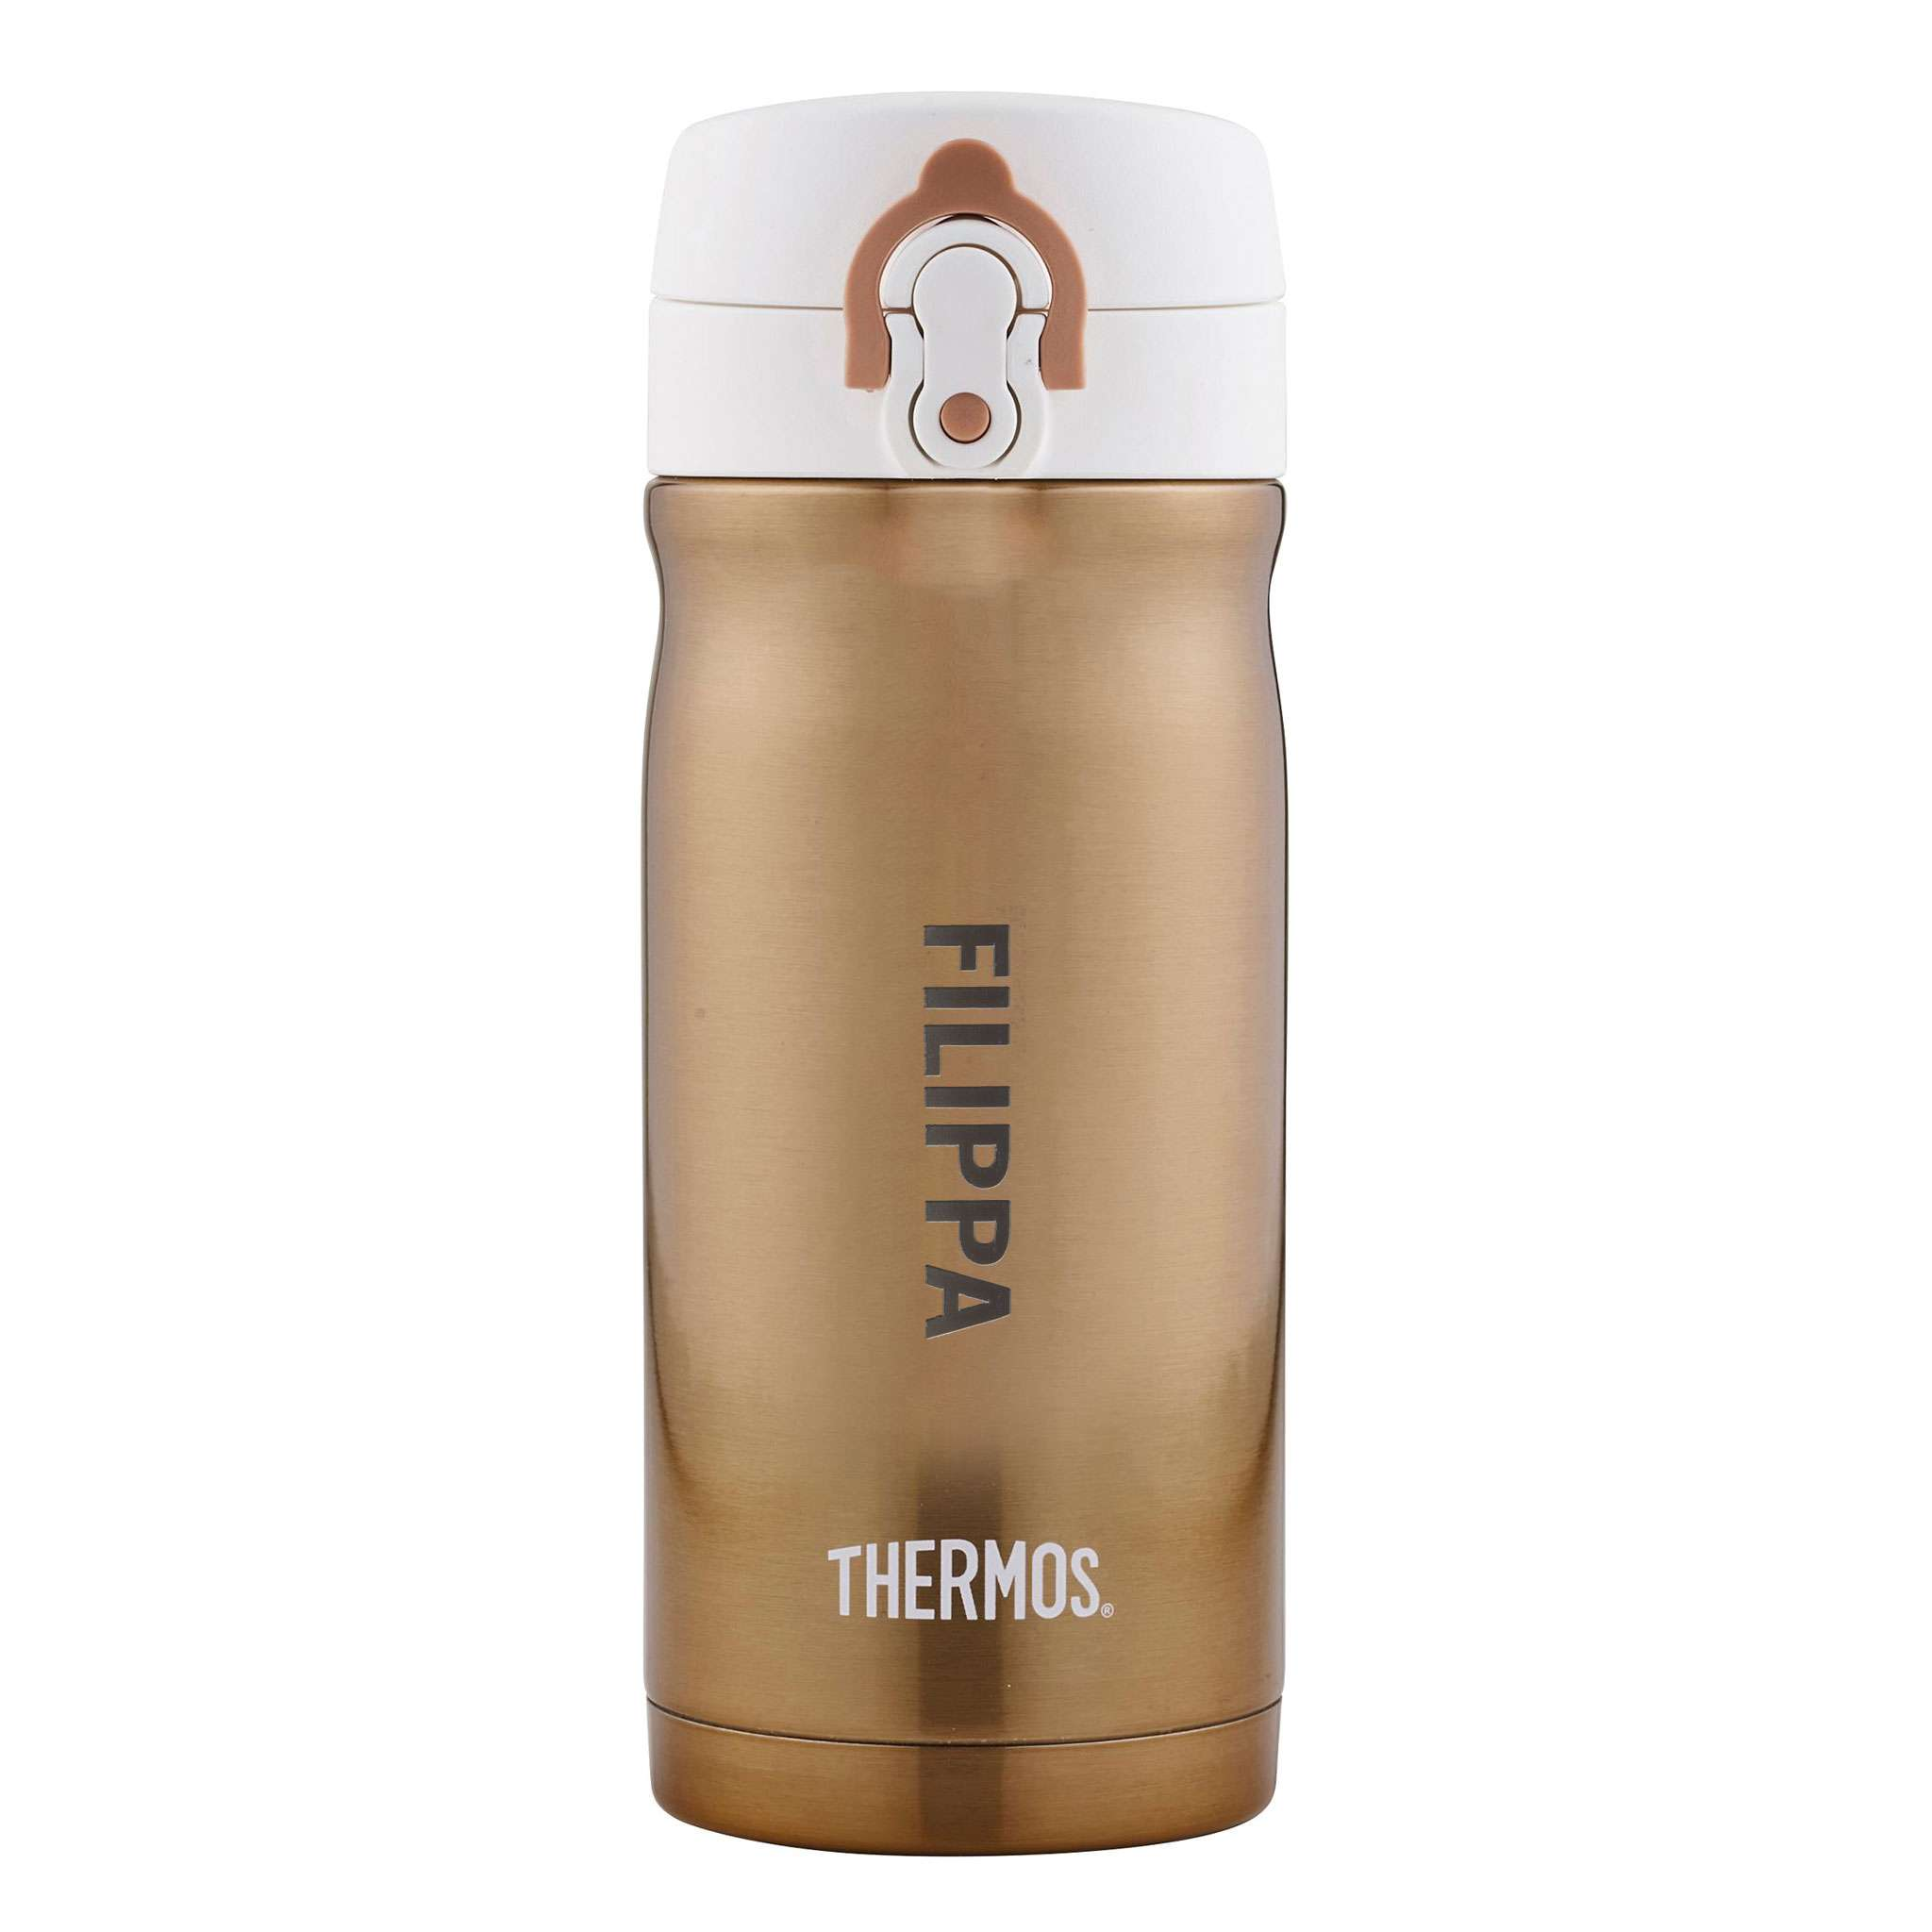 Thermos JMY Termosmugg 0,35 liter, Guld